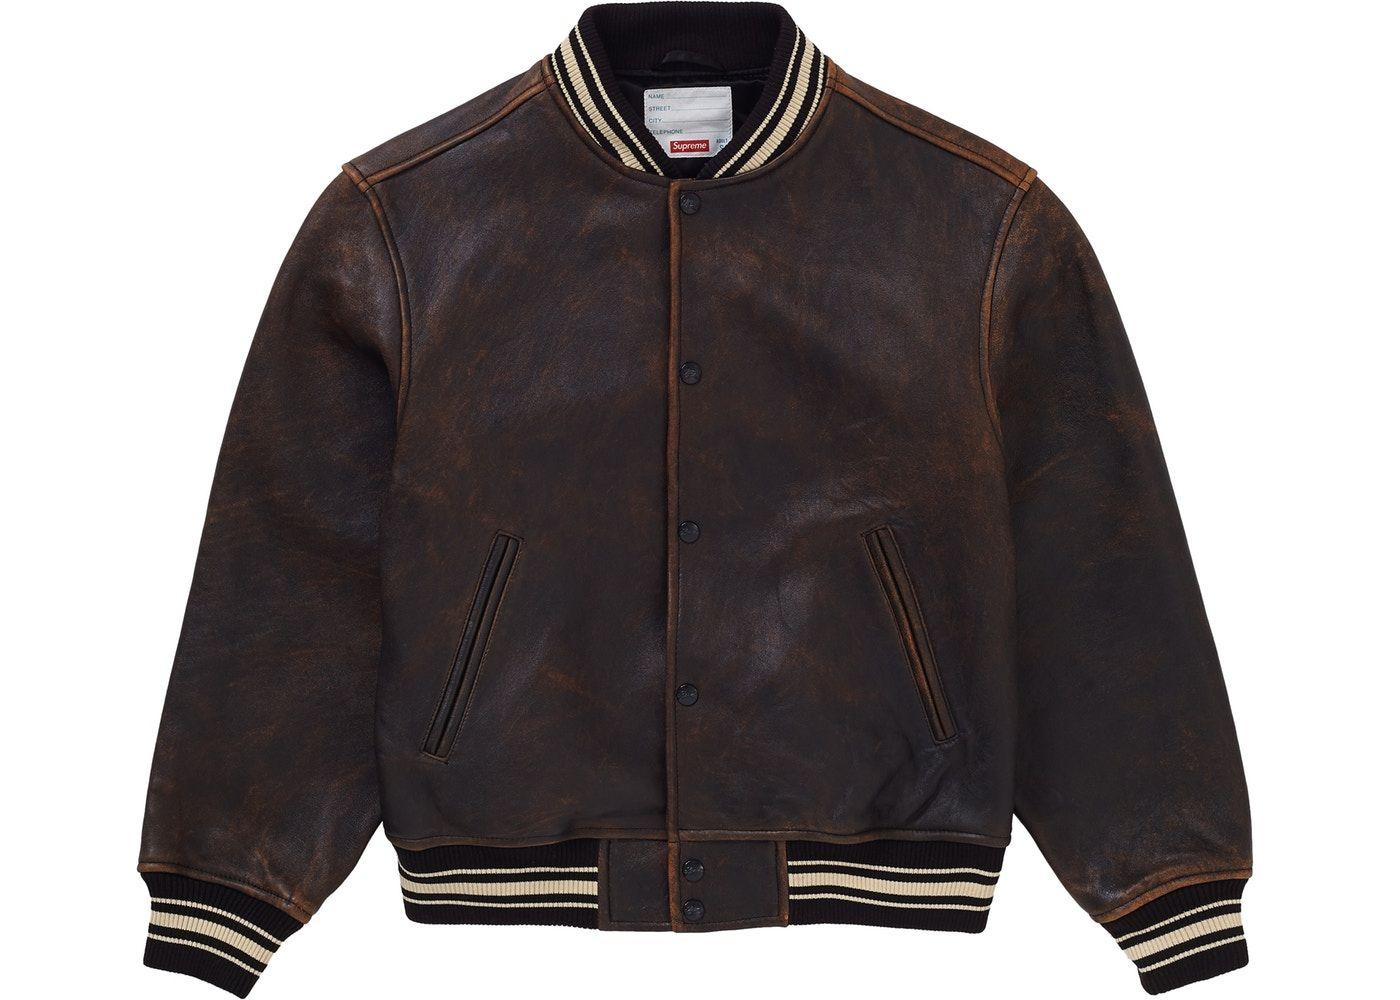 Supreme Worn Leather Varsity Jacket Black in 2020